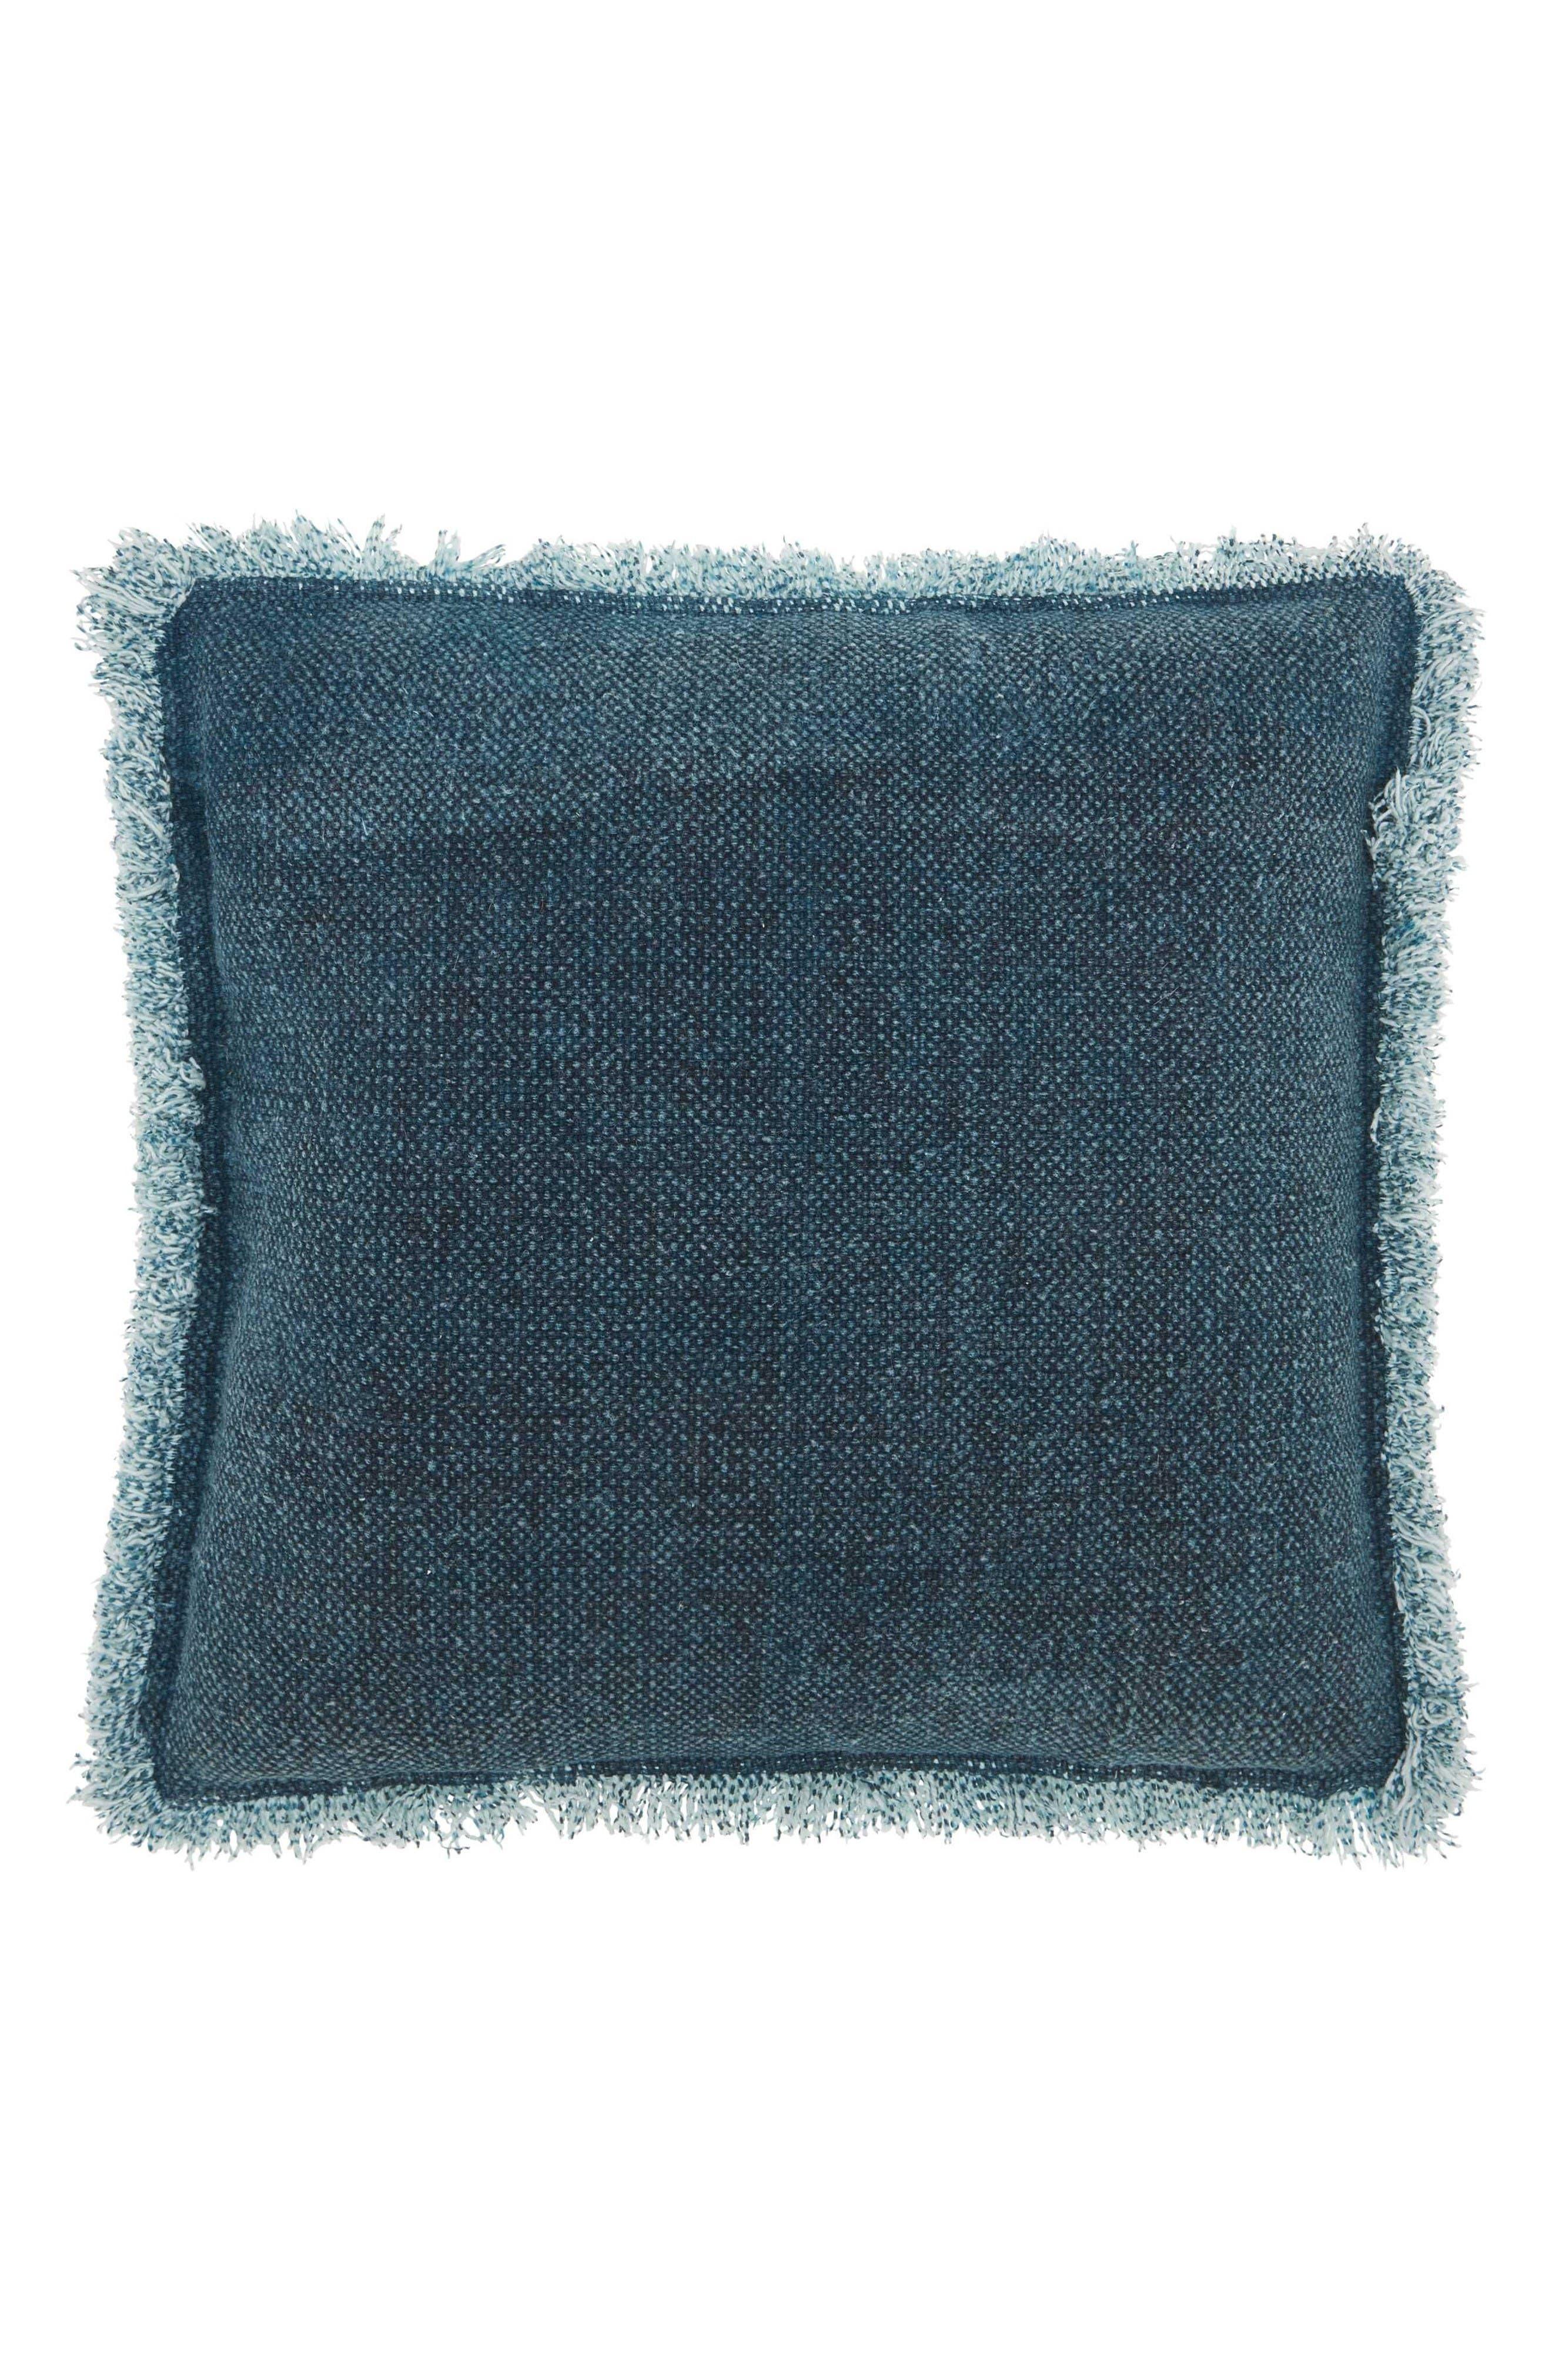 Mina Victory Stonewash Fringe Accent Pillow